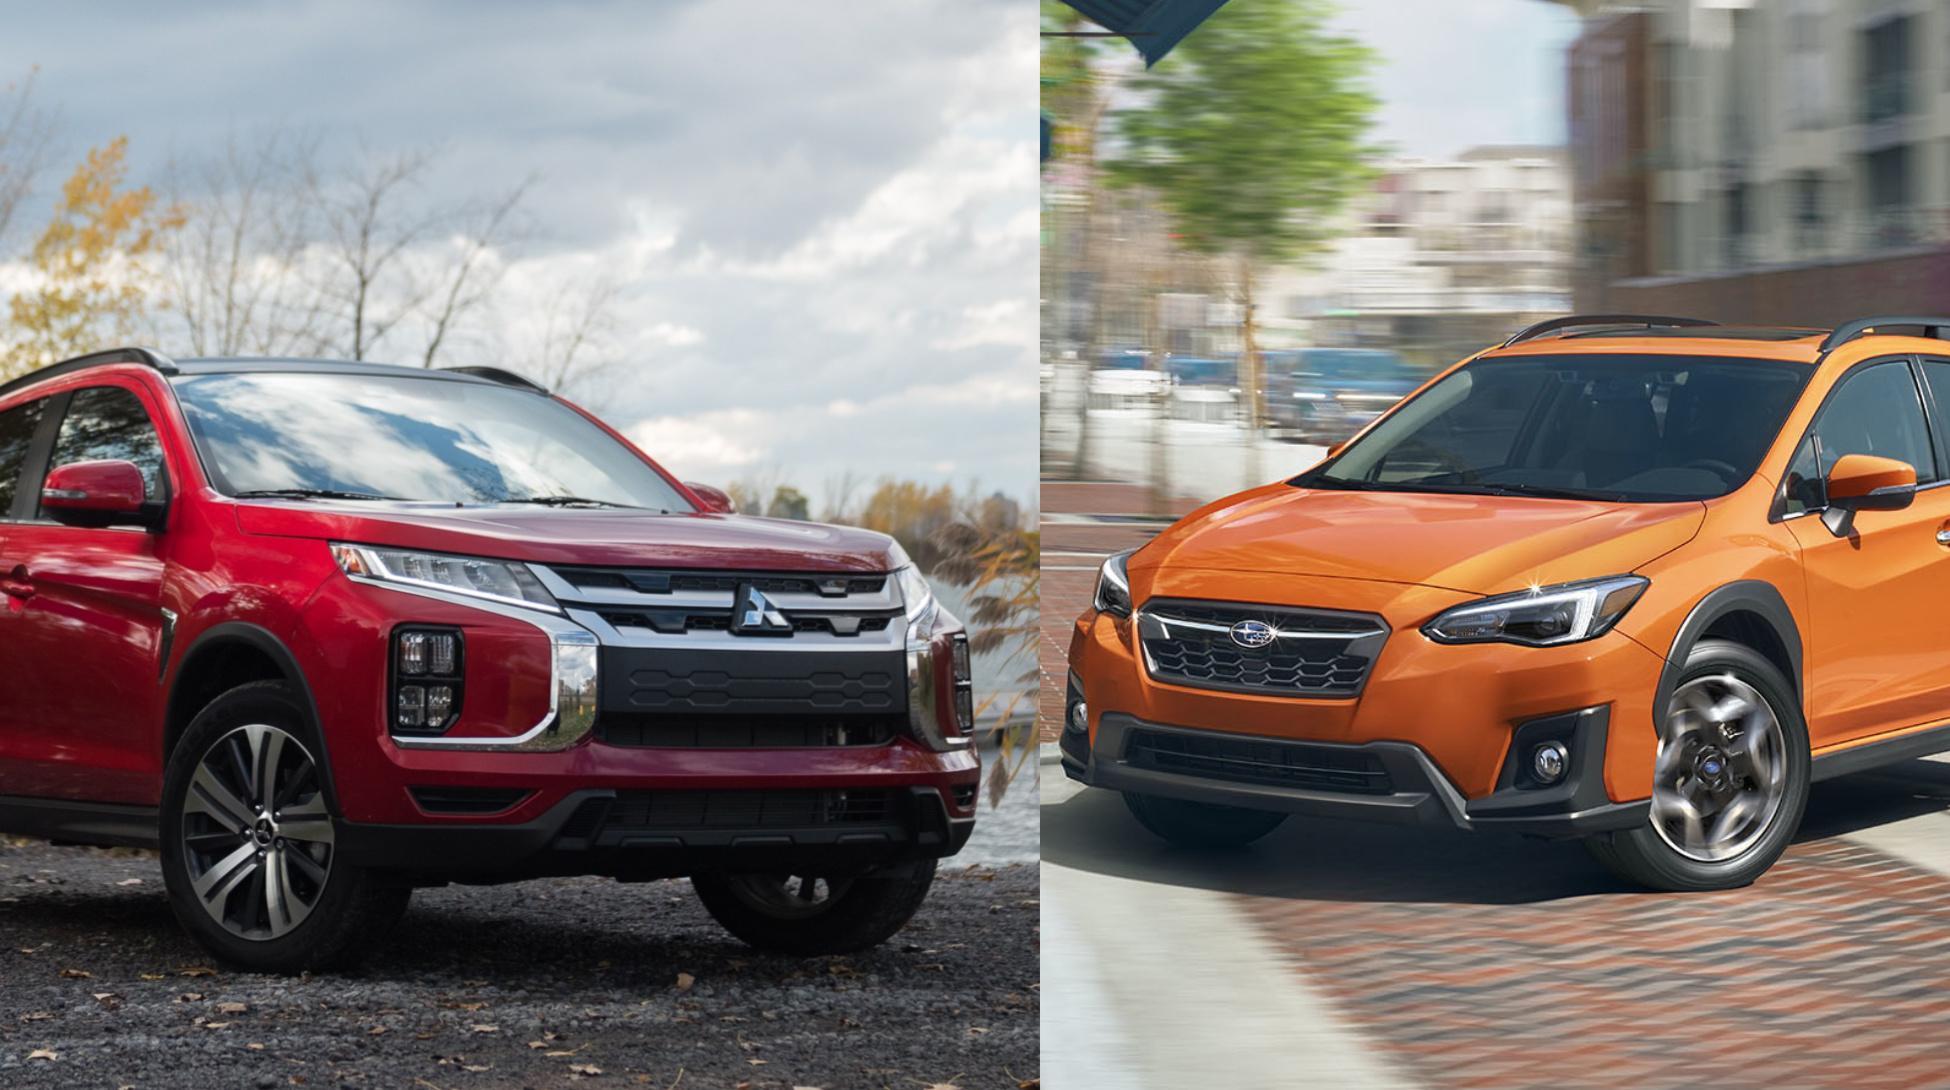 Mitsubishi RVR 2020 vs Subaru Crosstrek 2020